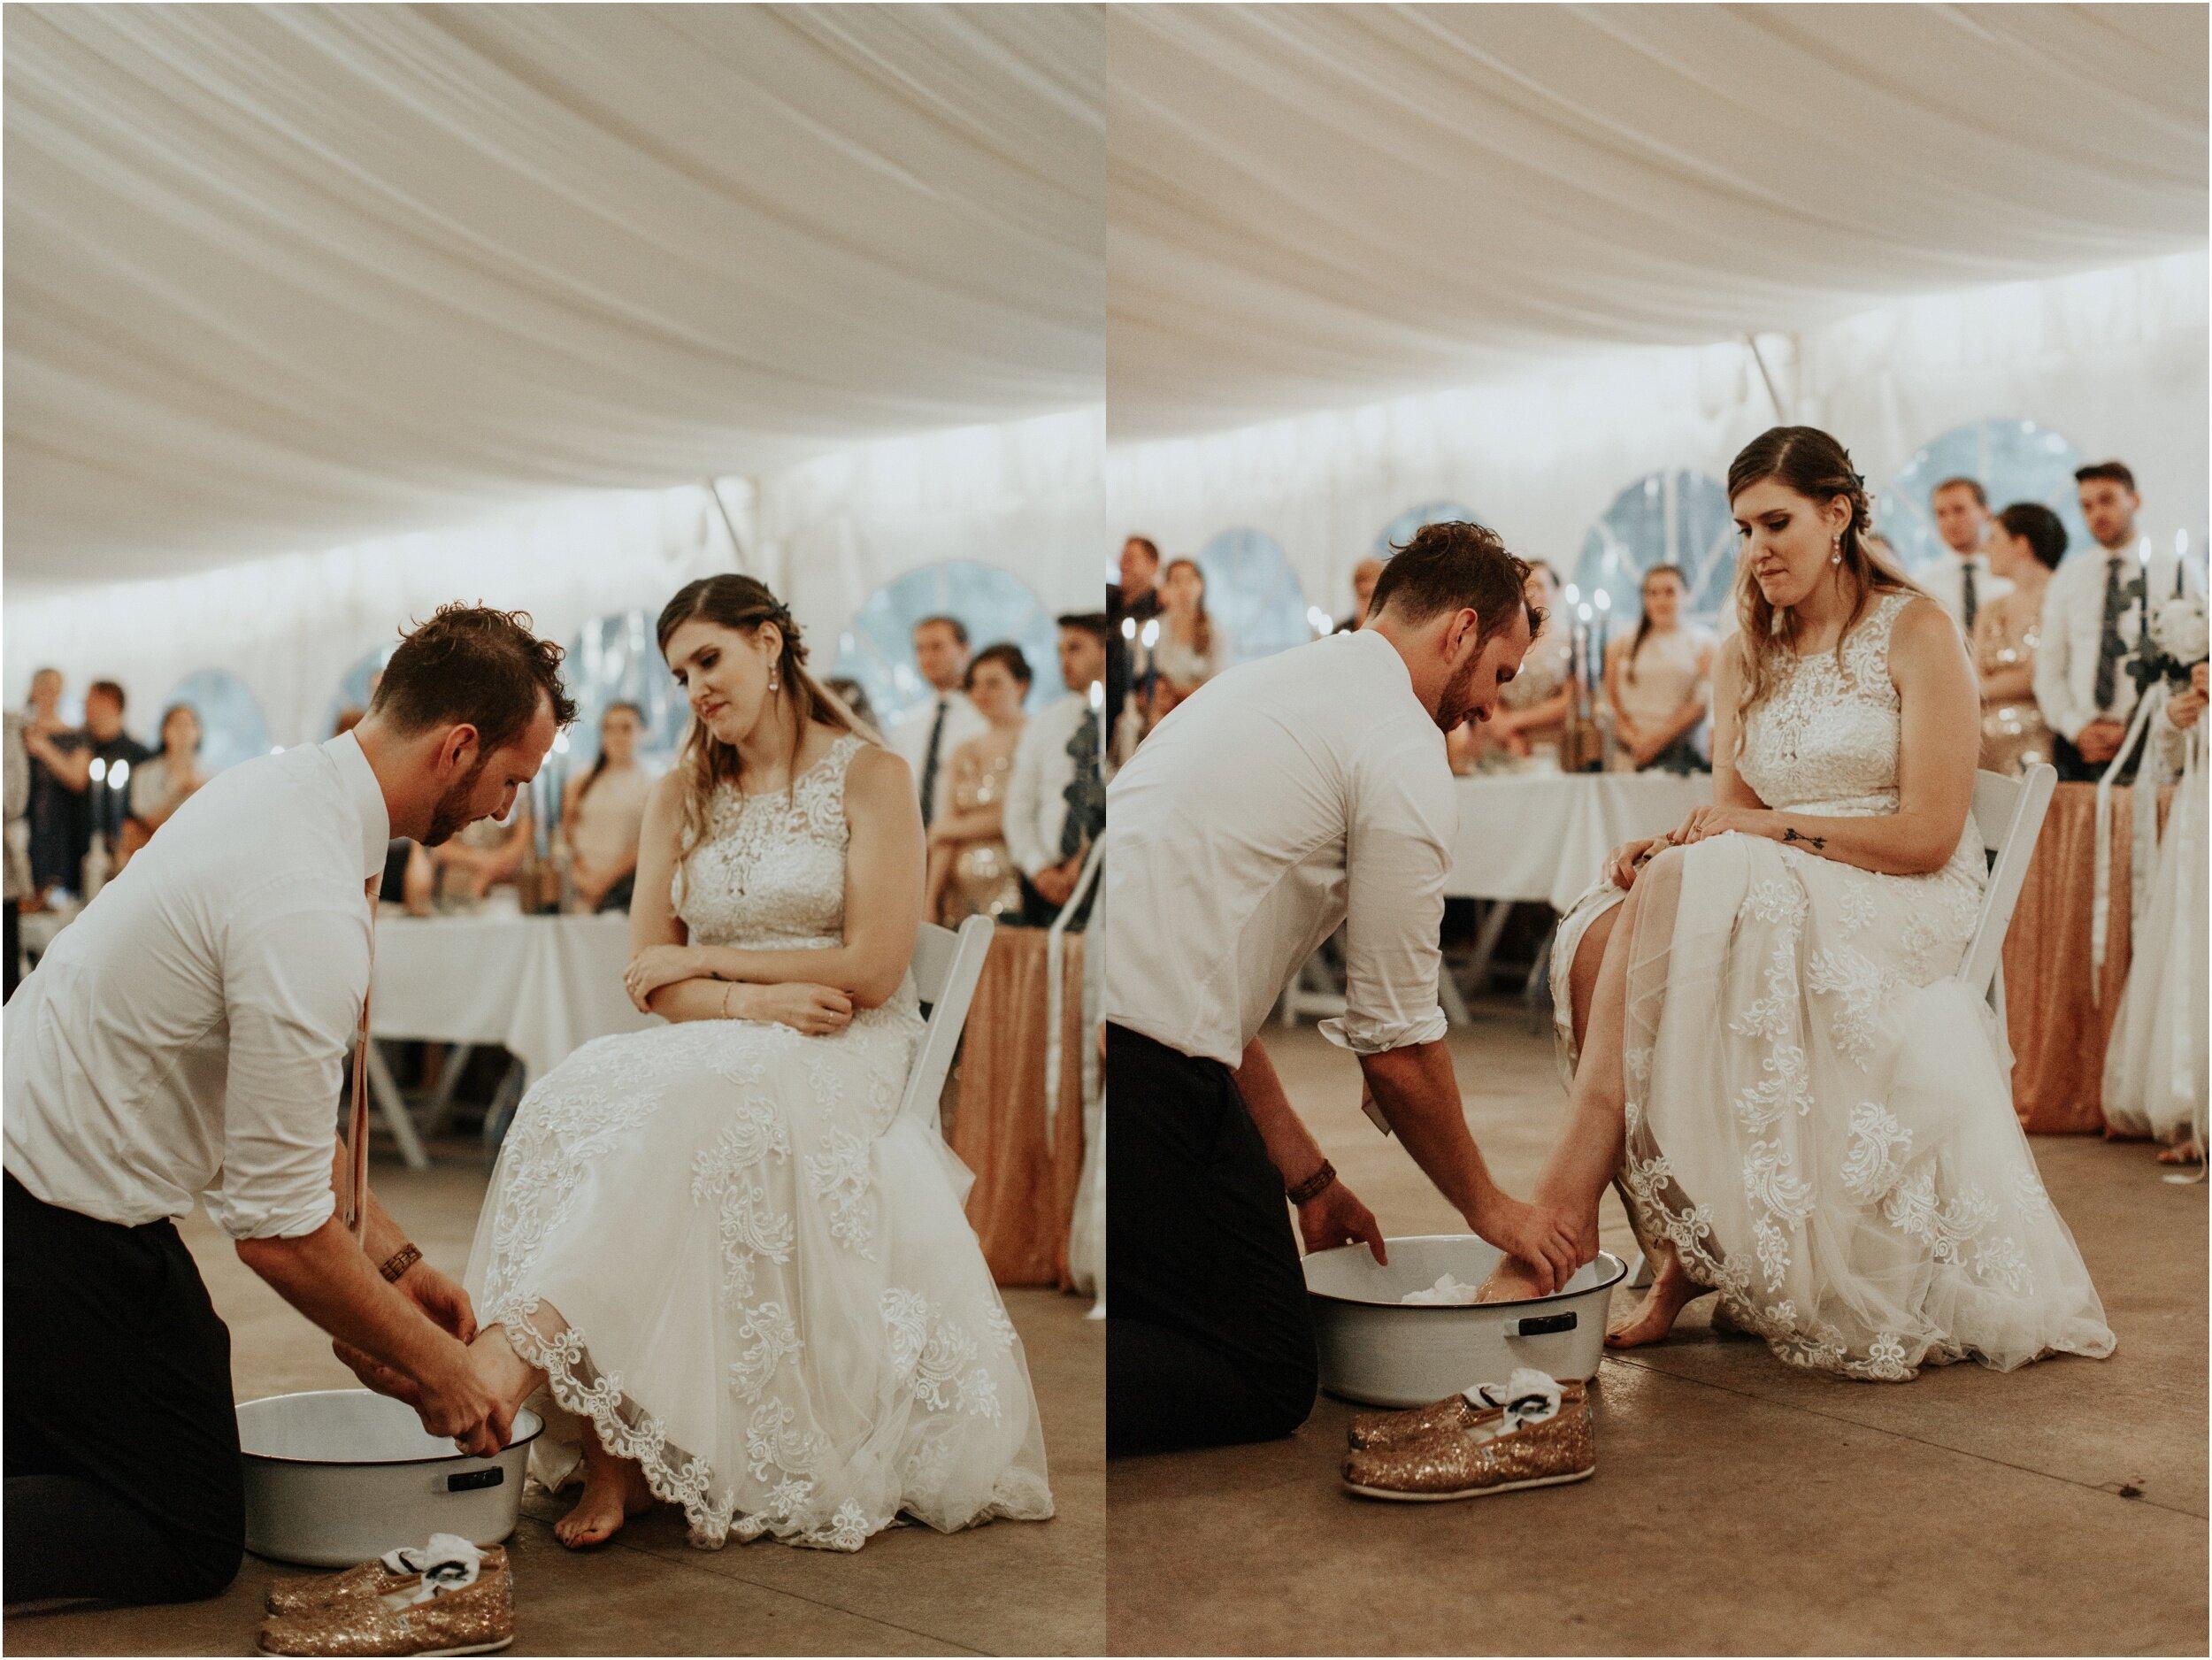 steph-and-jordan-cox-our-wedding-historic-shady-lane-compass-wedding-collective-hazel-lining-photography-destination-elopement-wedding-engagement-photography_0088.jpg